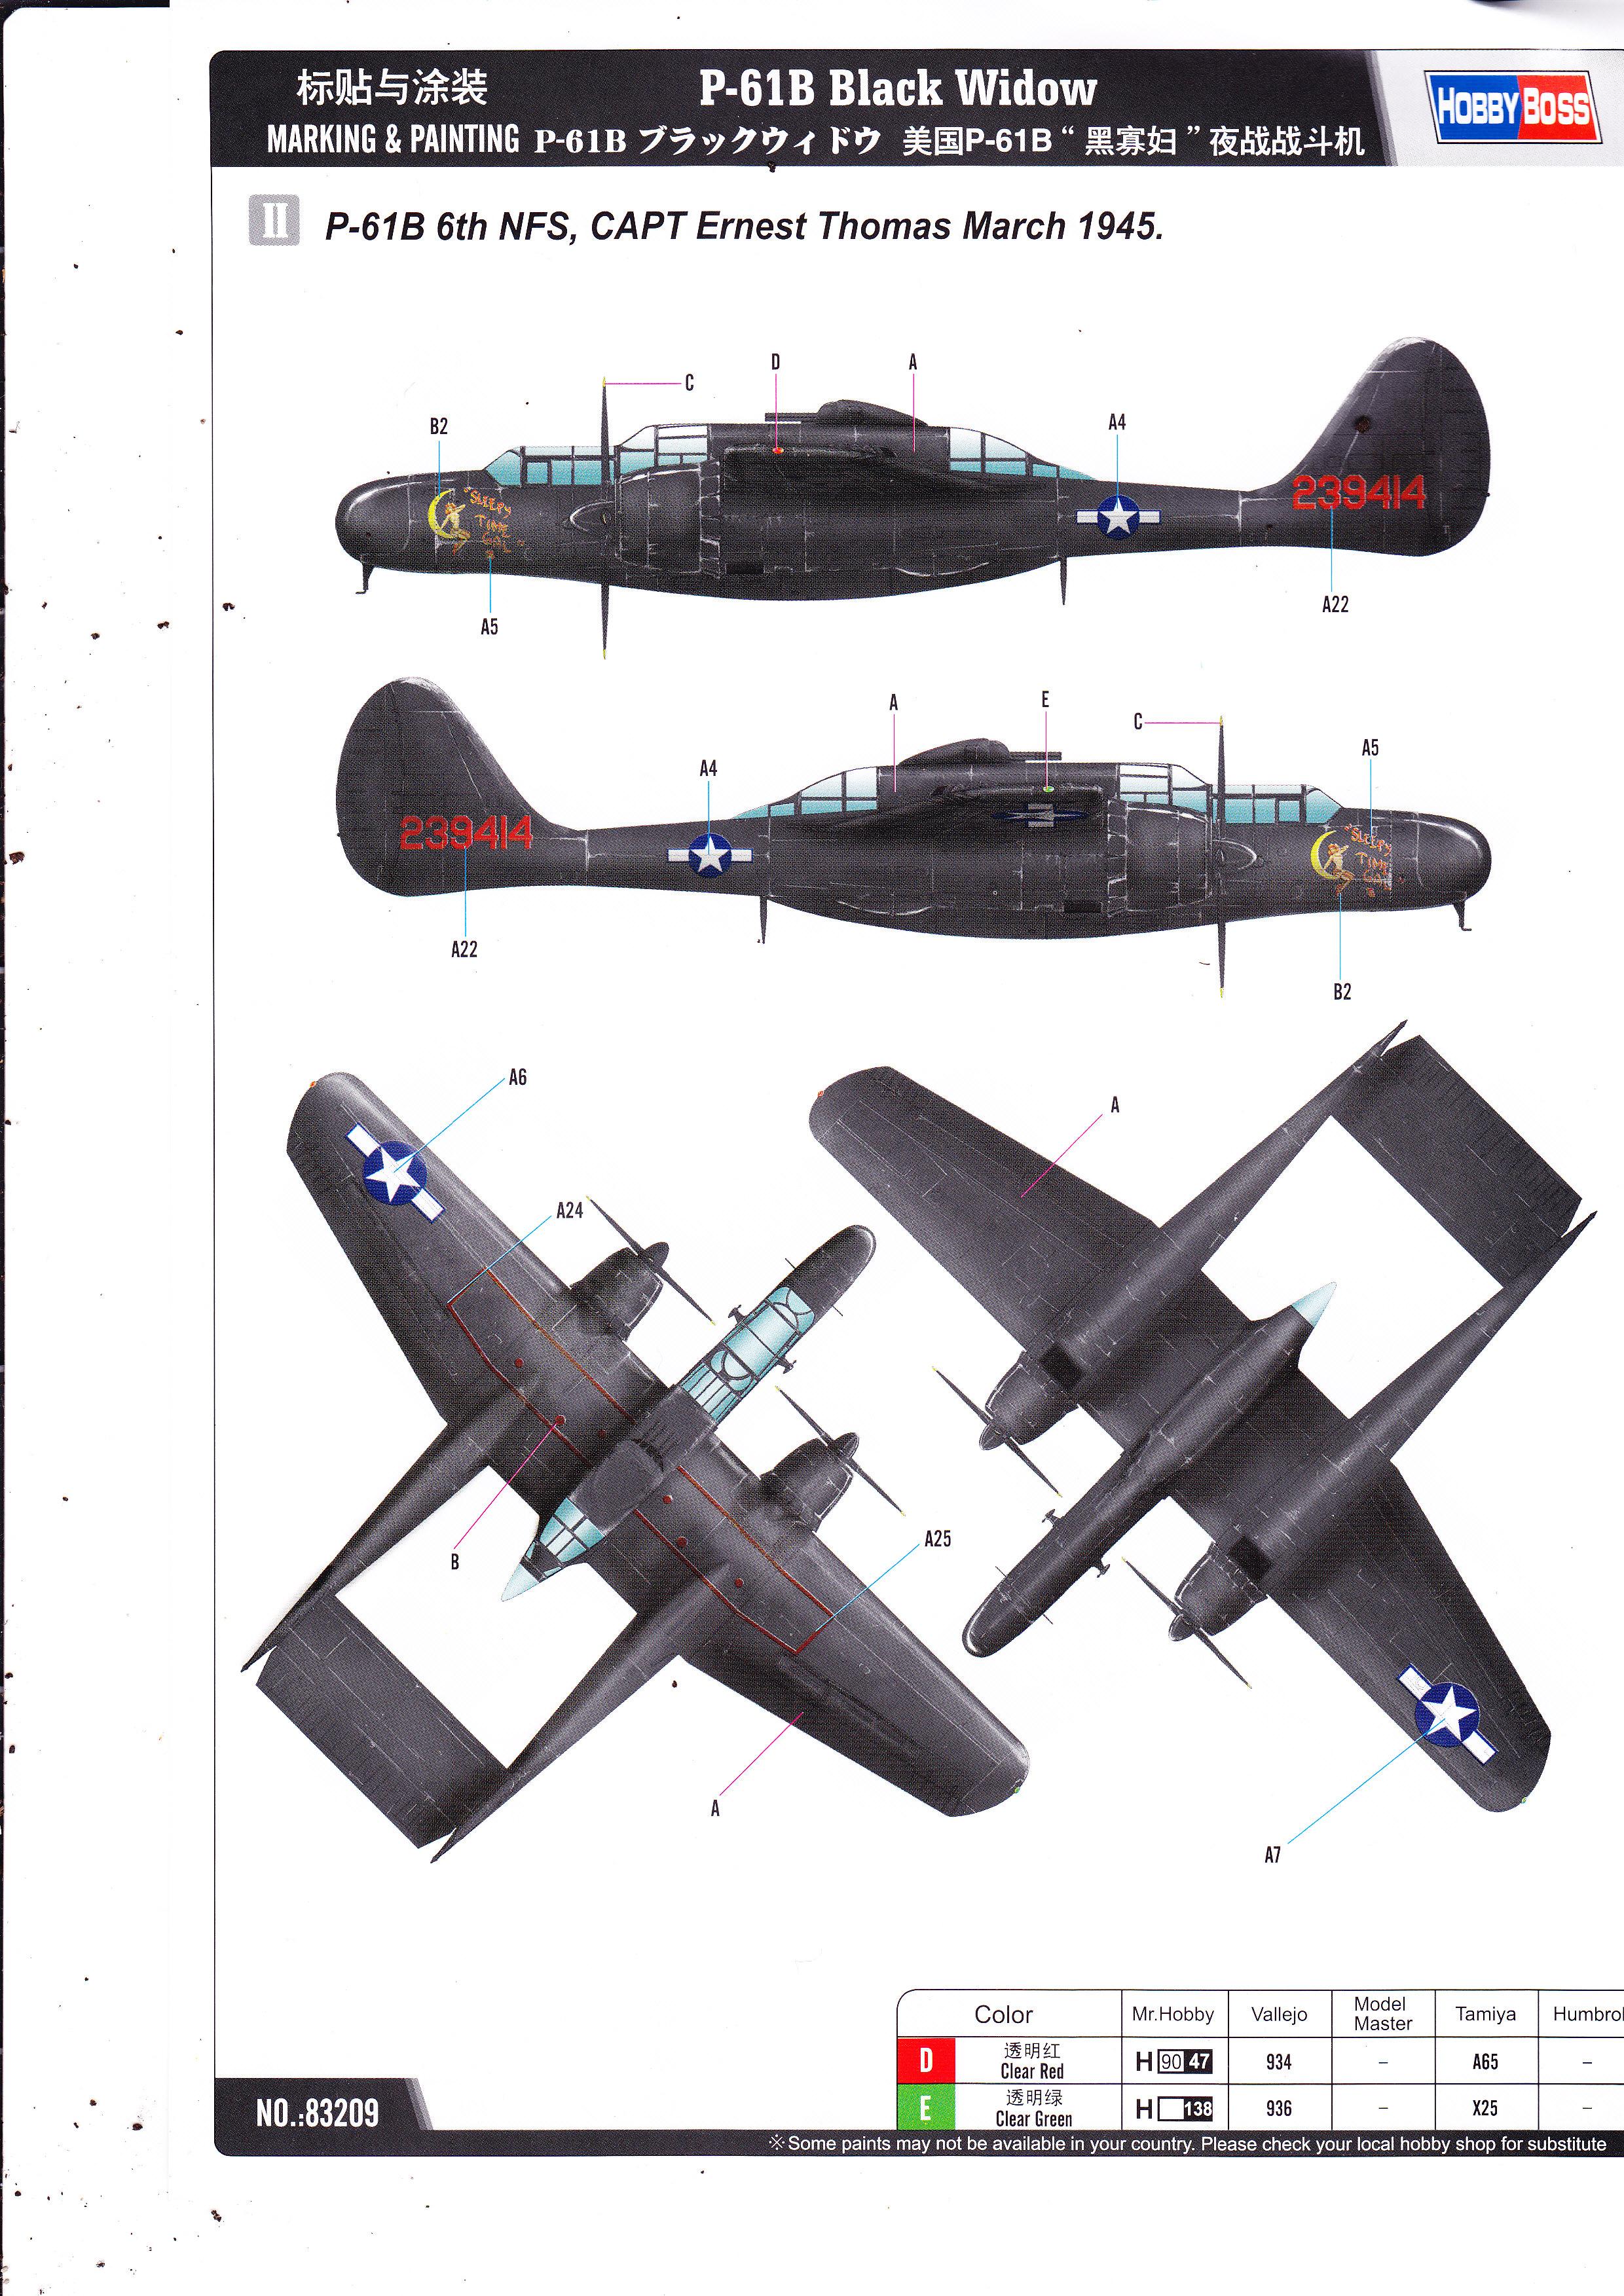 P-61 B Black Widow Hobby Boss Img0003qgk